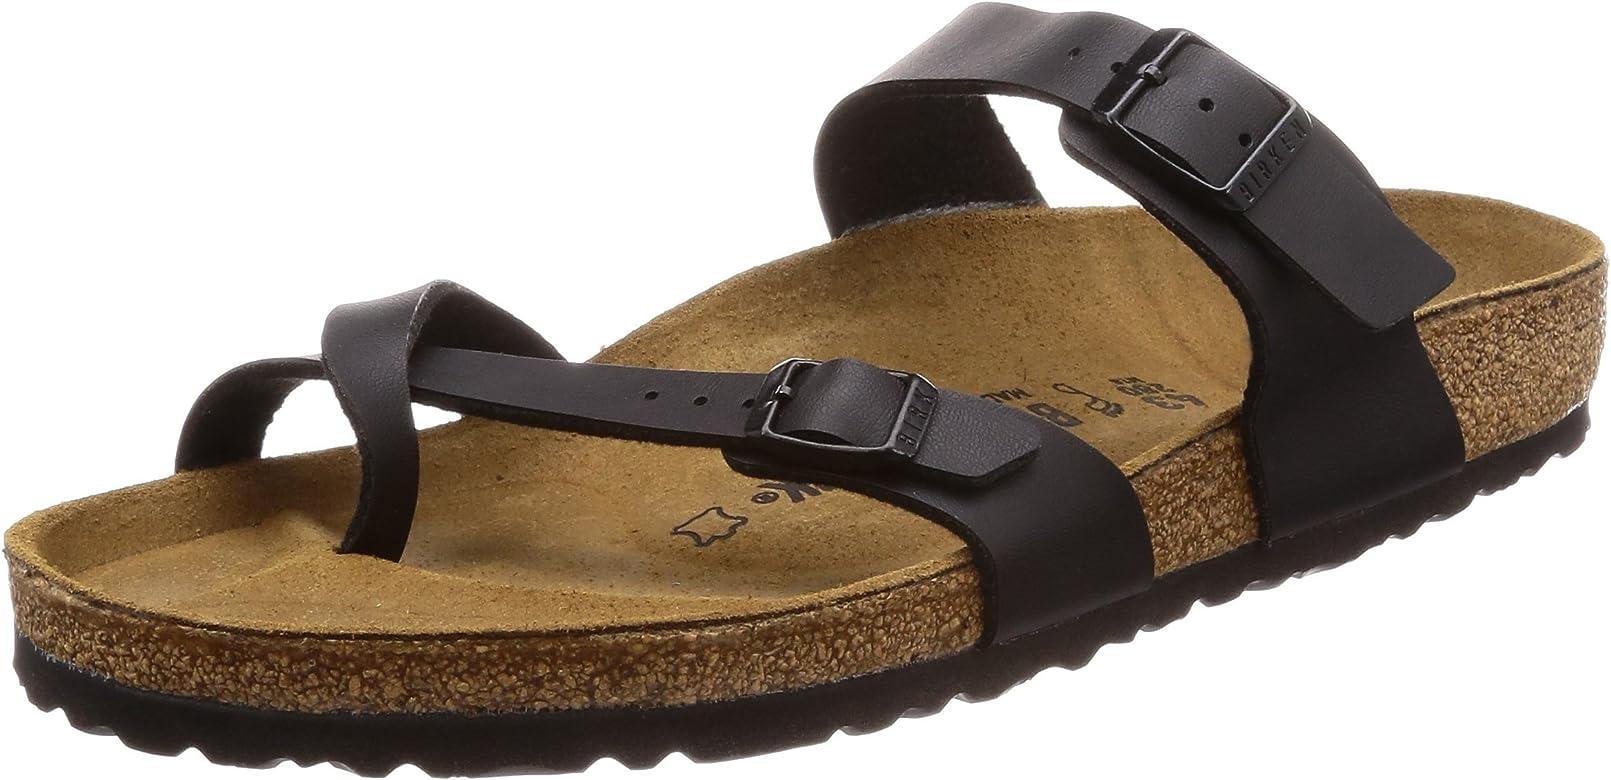 7d7adf1287f70 Women's Mayari Birko-Flor Vegan Slide On Sandals 1009-990